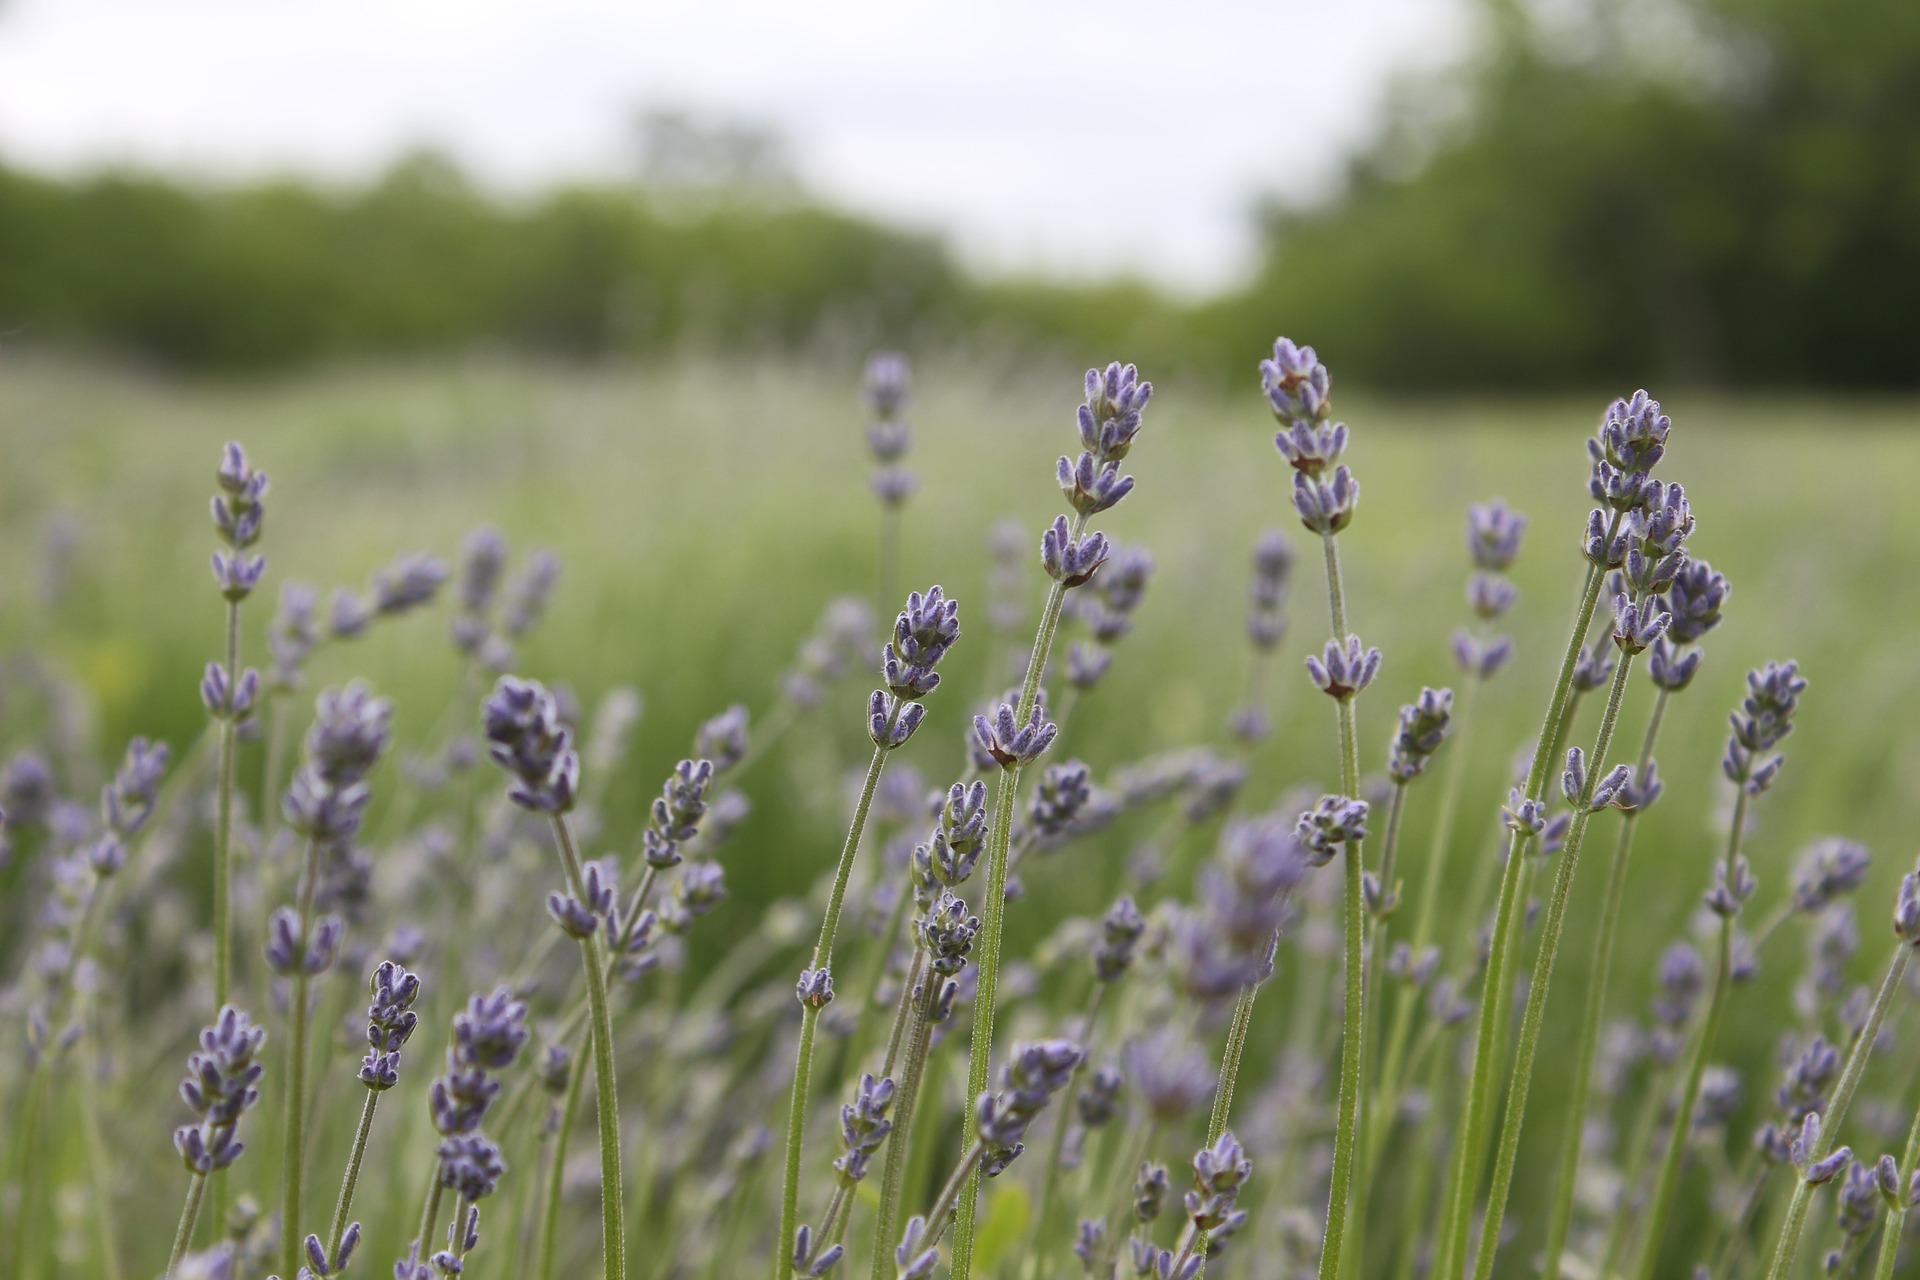 Divine Lotus Healing Lavender Field Essential Oils